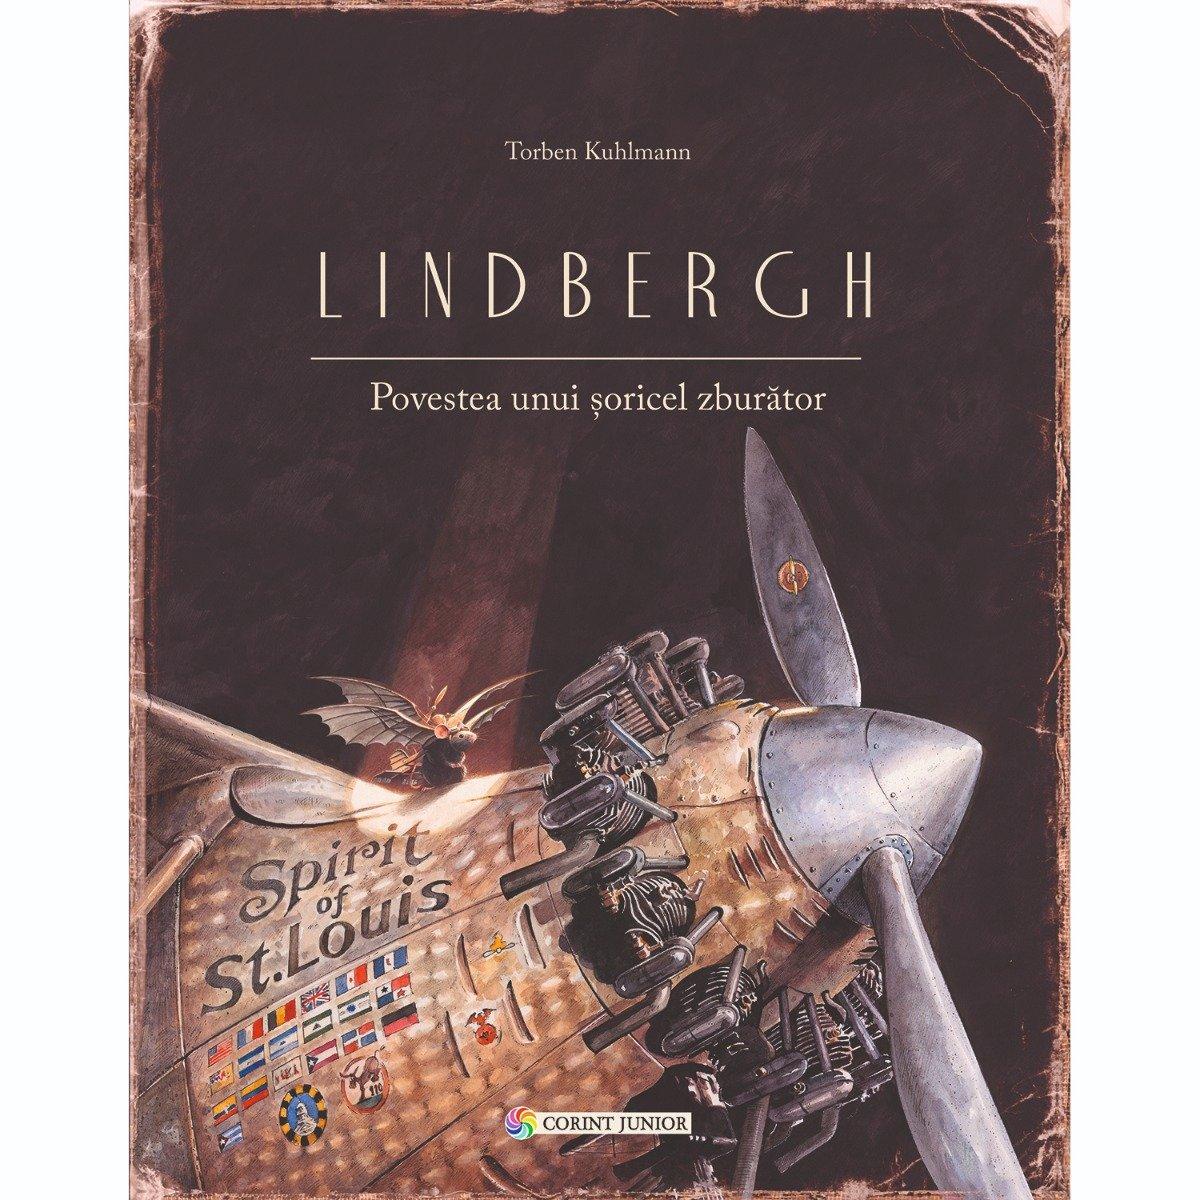 Carte Editura Corint, Lindbergh. Povestea unui soricel zburator, Torben Kuhlmann